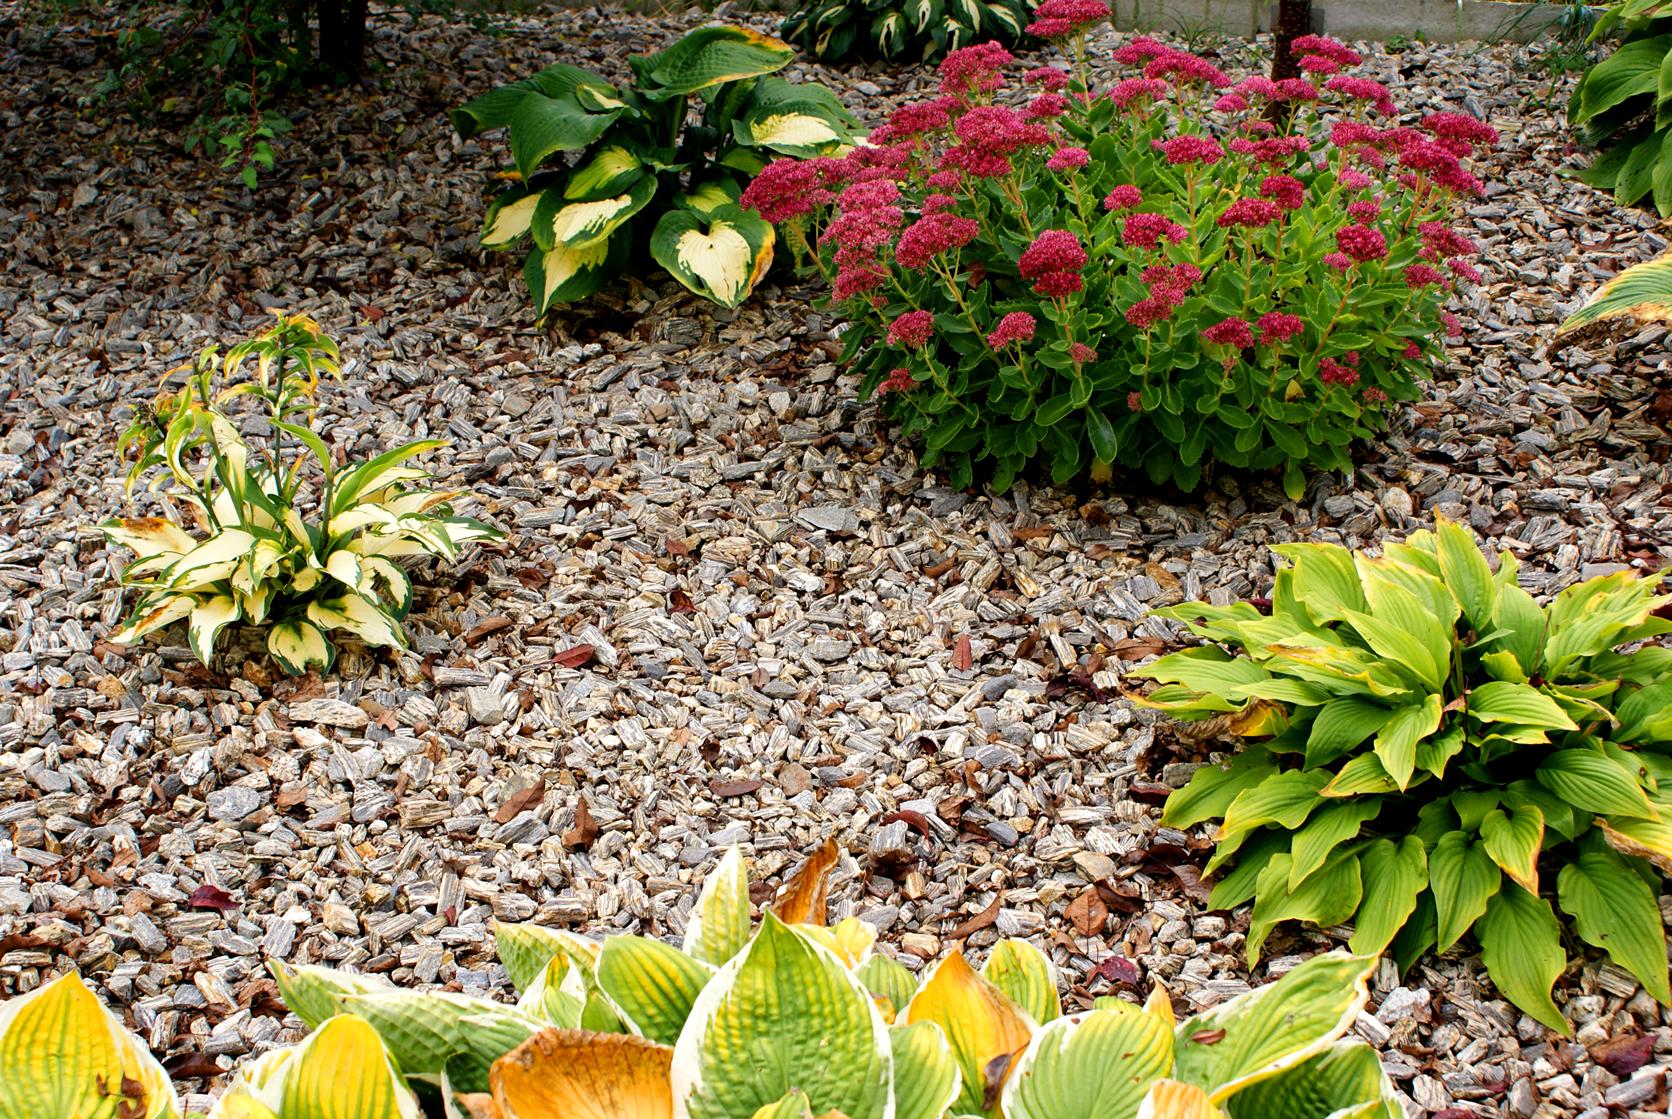 kamień ozdobny do ogrodu